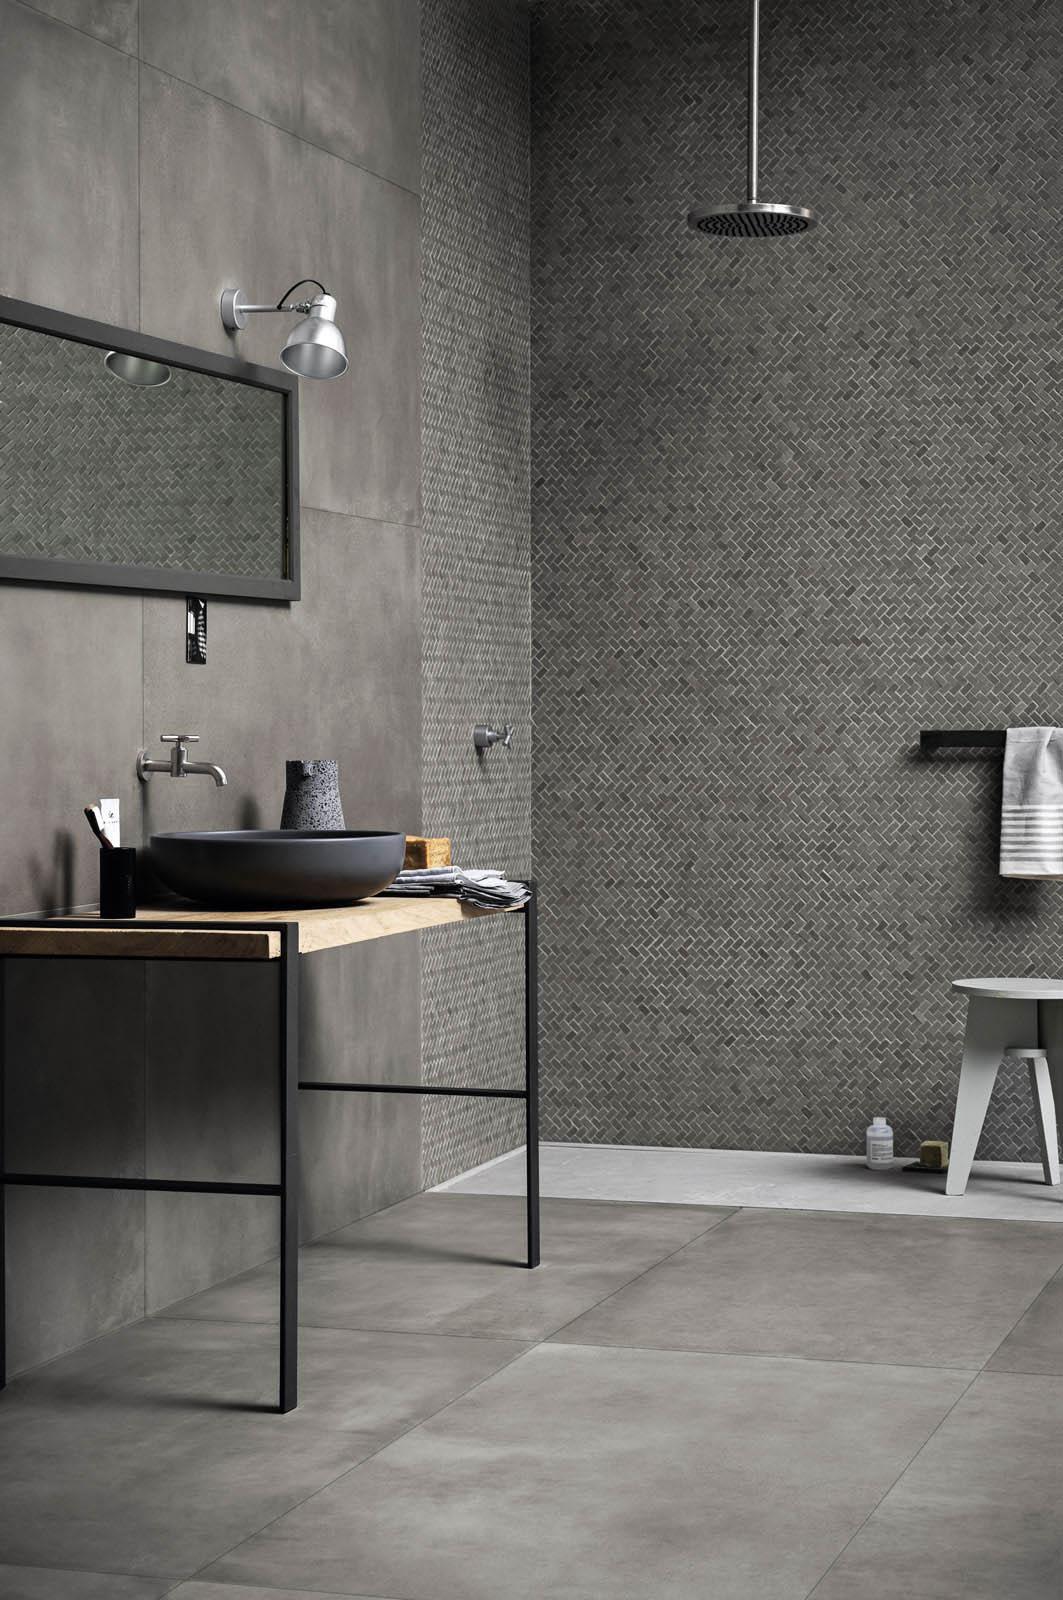 Bathroom flooring ceramic and porcelain stoneware marazzi for Carrelage marazzi